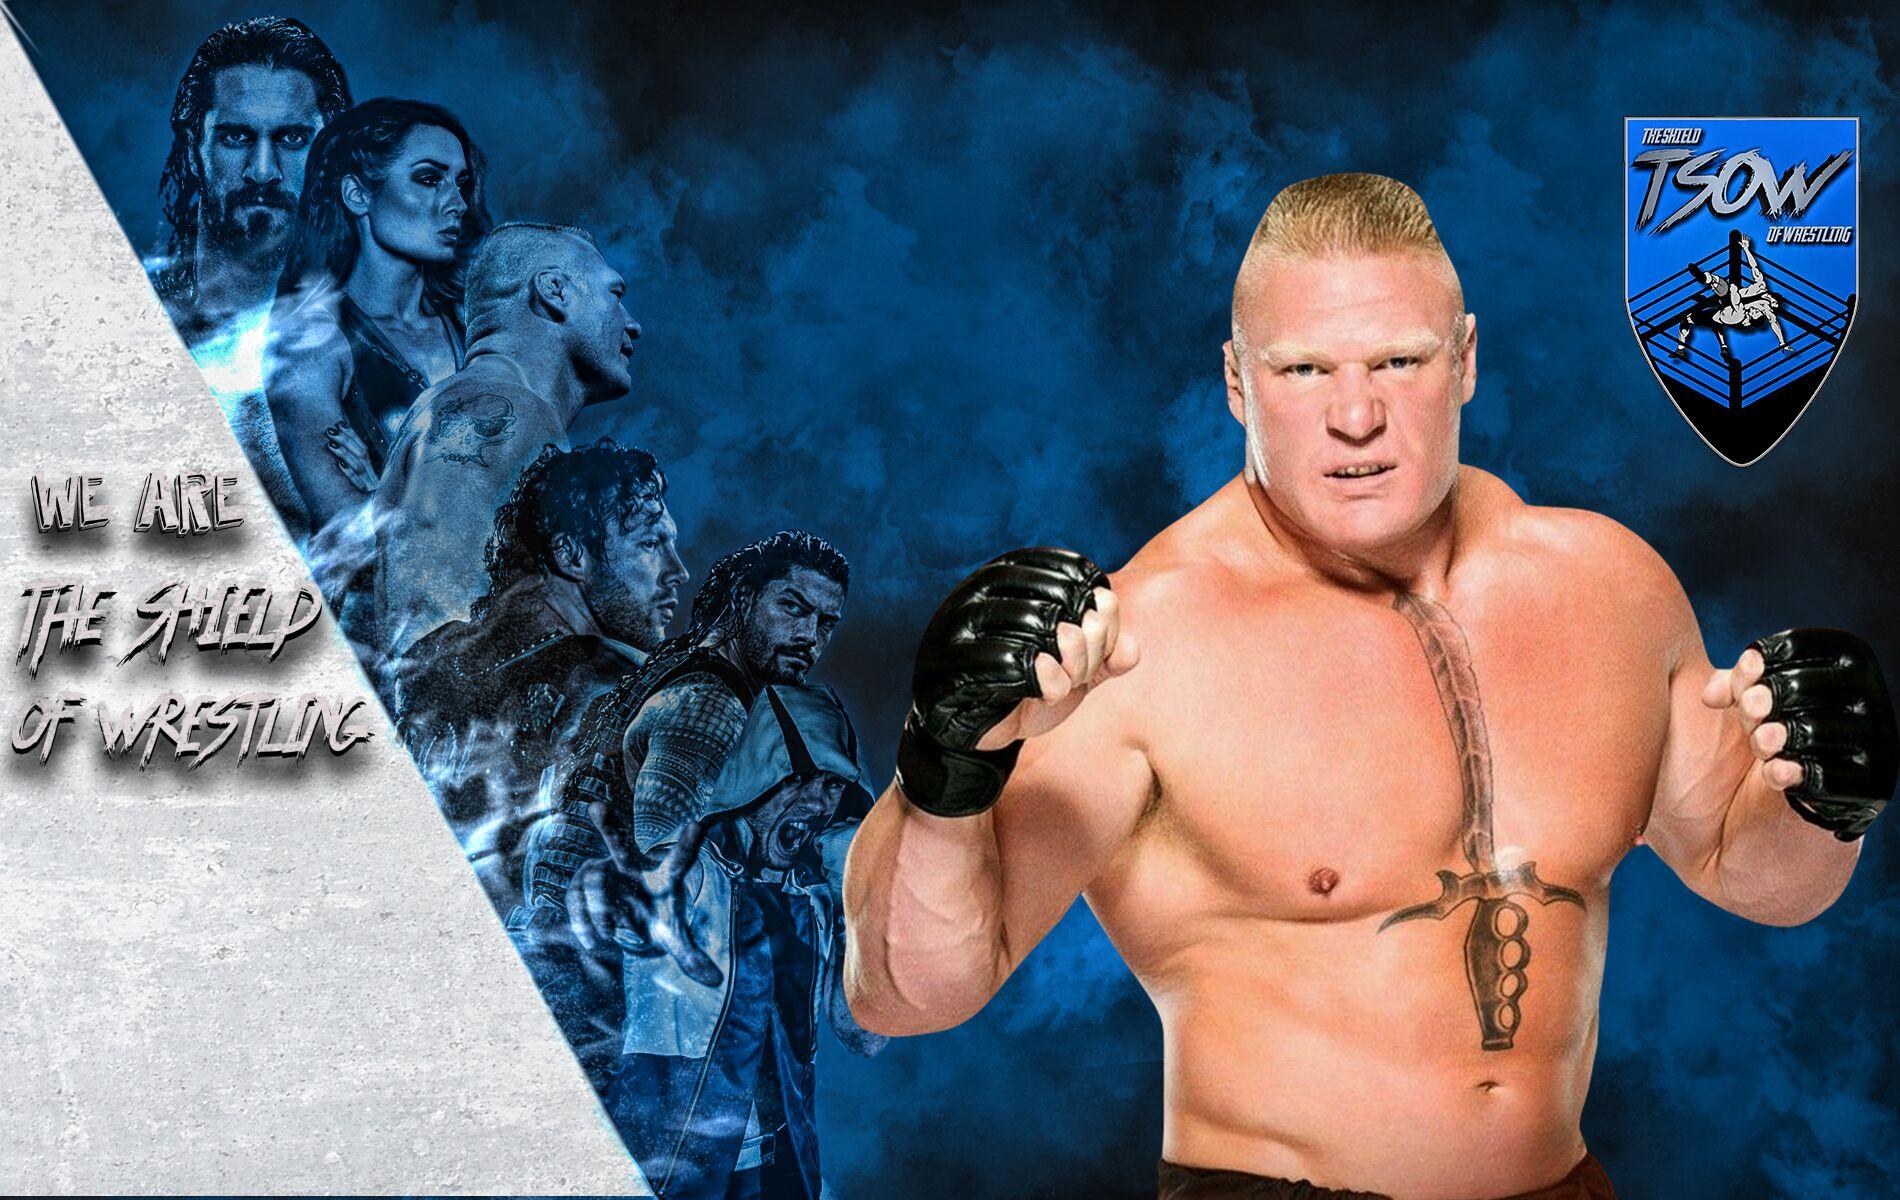 Chi affronterà Brock Lesnar - WrestleMania 36